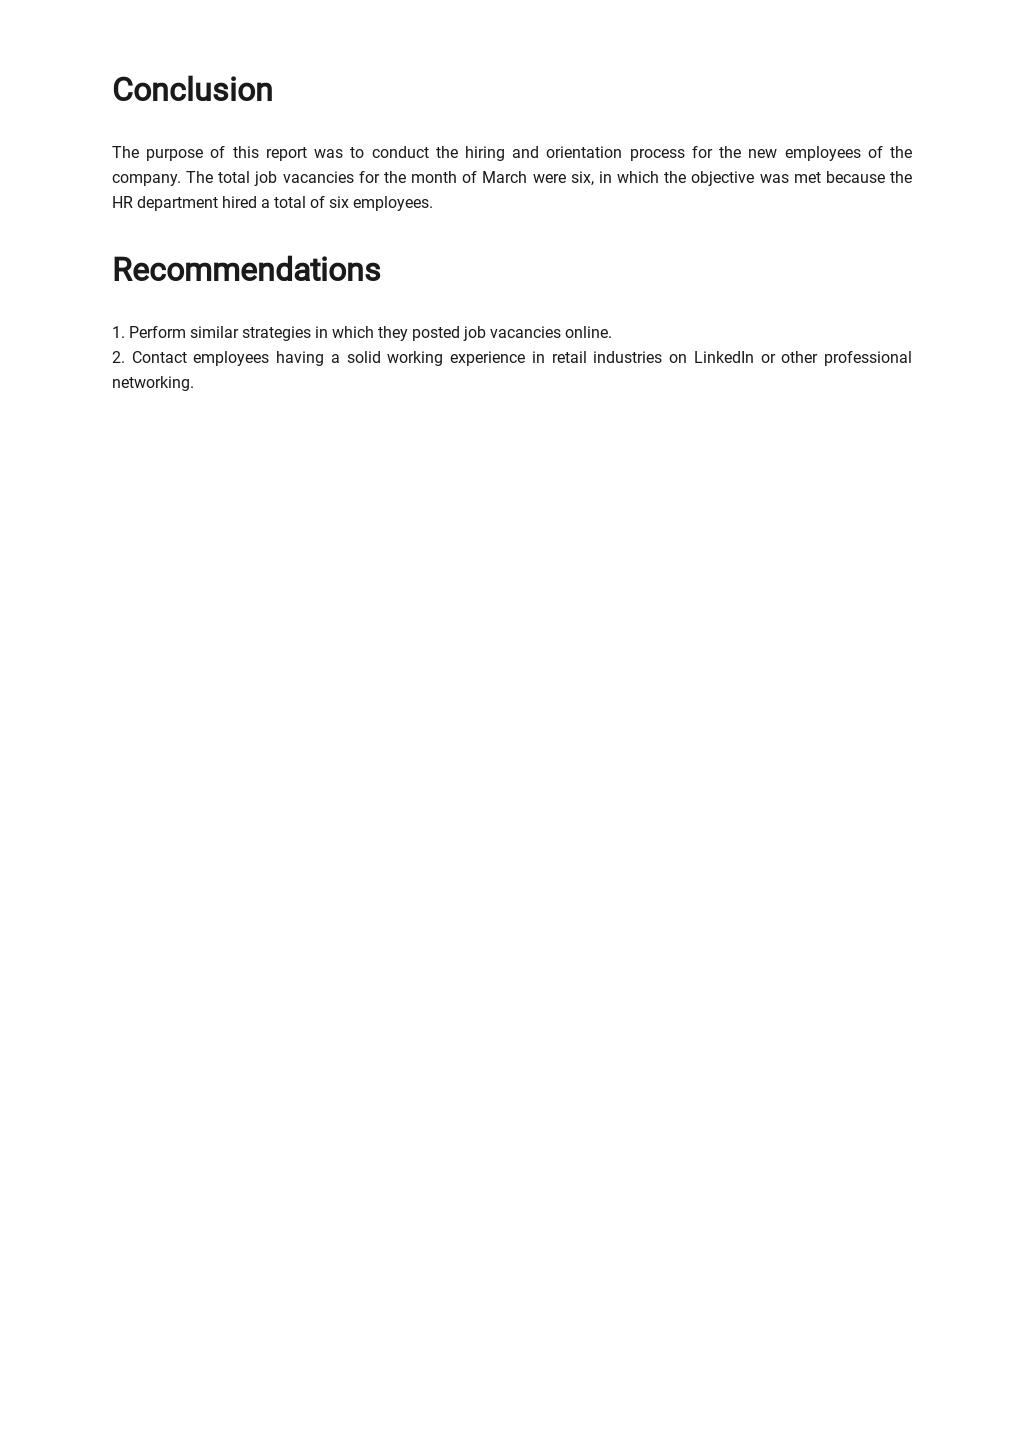 HR Executive Report Template 3.jpe